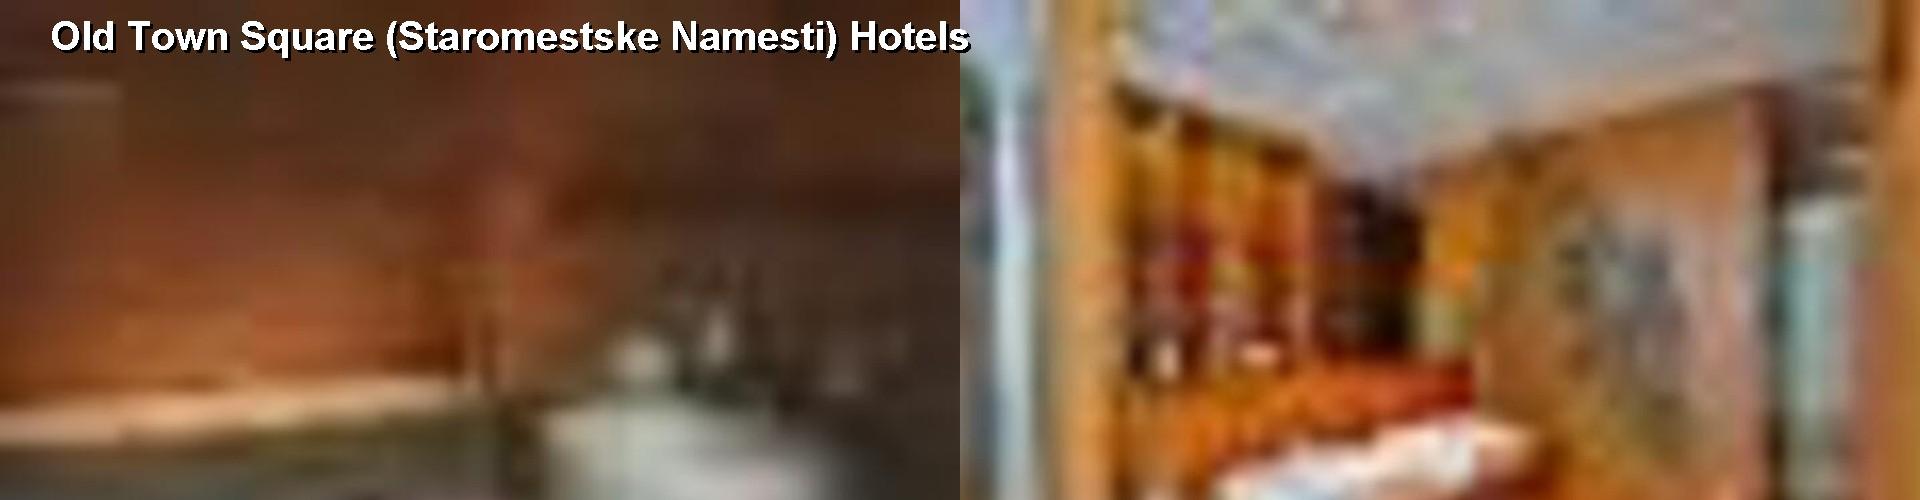 5 Best Hotels Near Old Town Square Staromestske Namesti